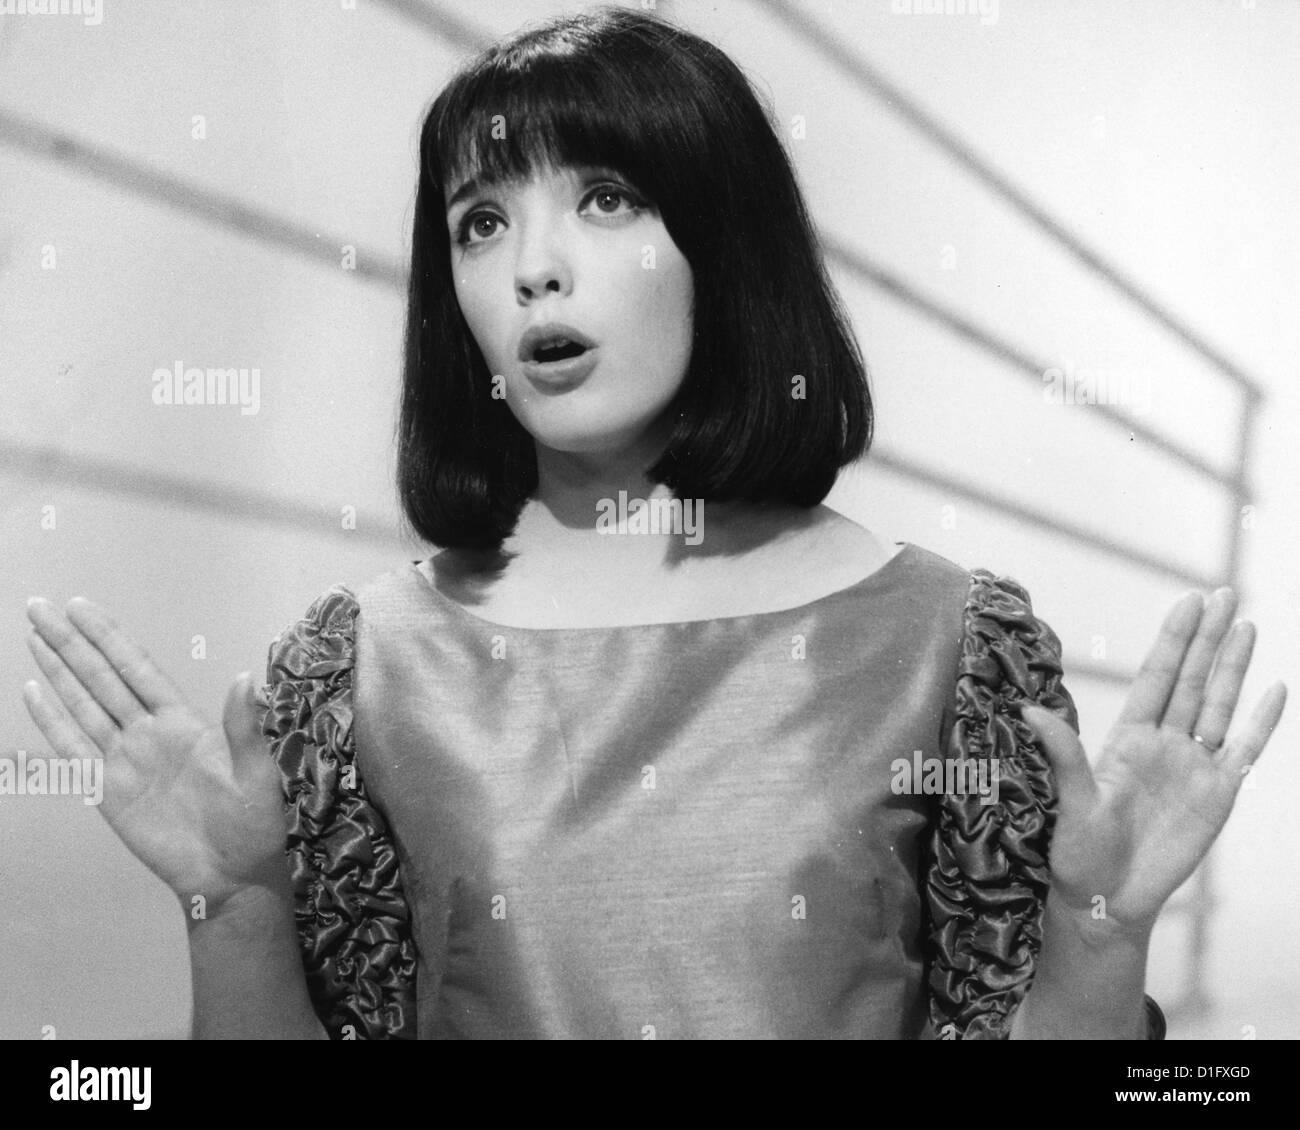 billie davis uk pop singer about stock photo royalty billie davis uk pop singer about 1965